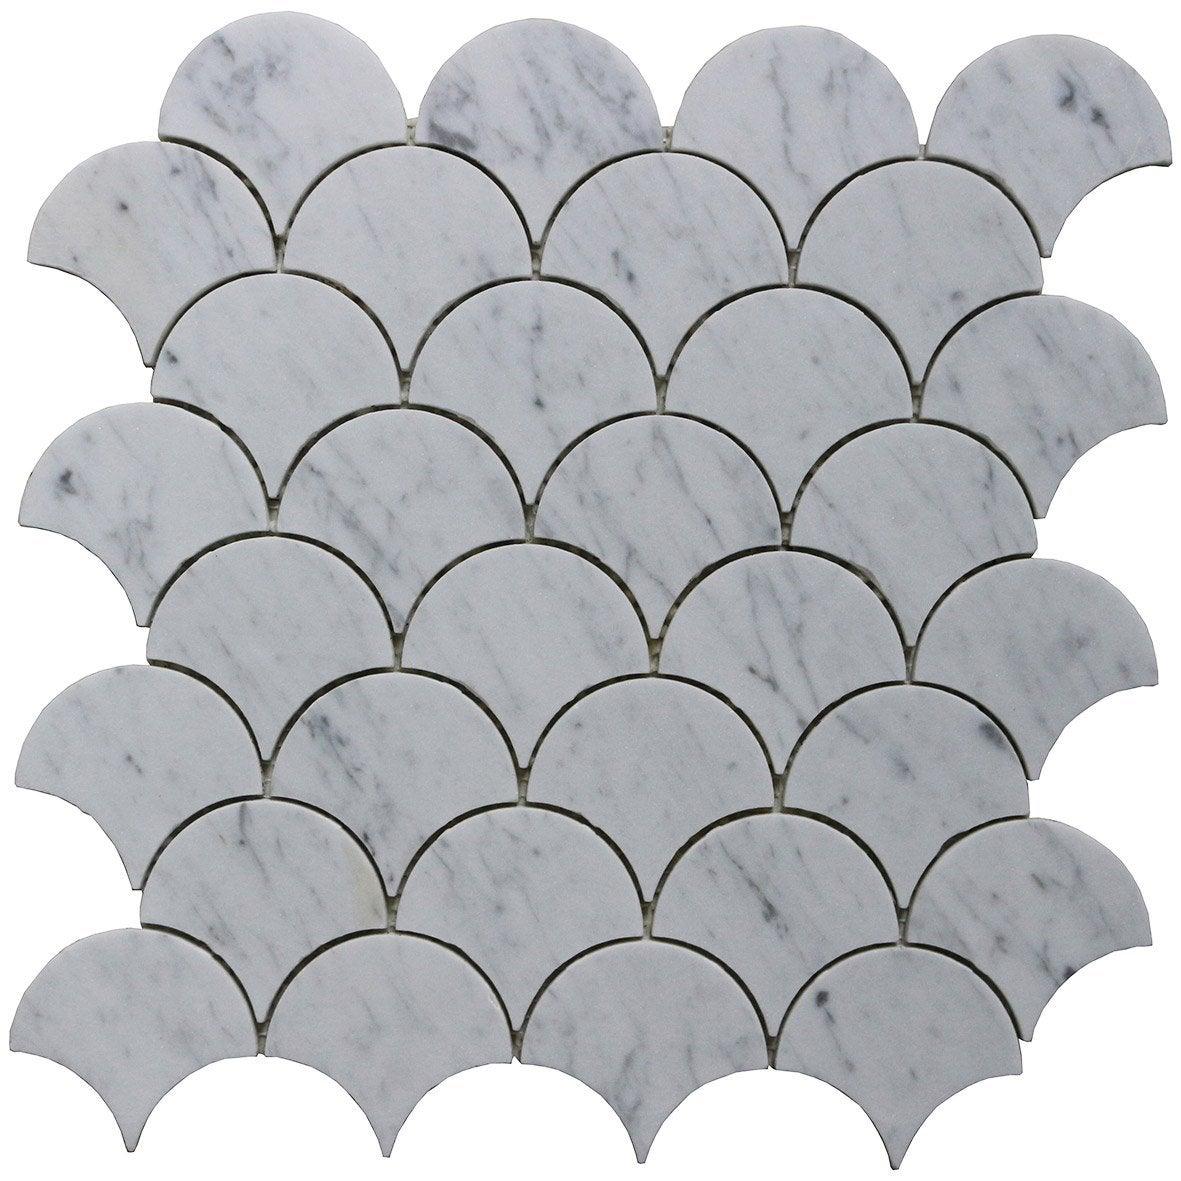 Mosaïque mur Mineral scale blanc